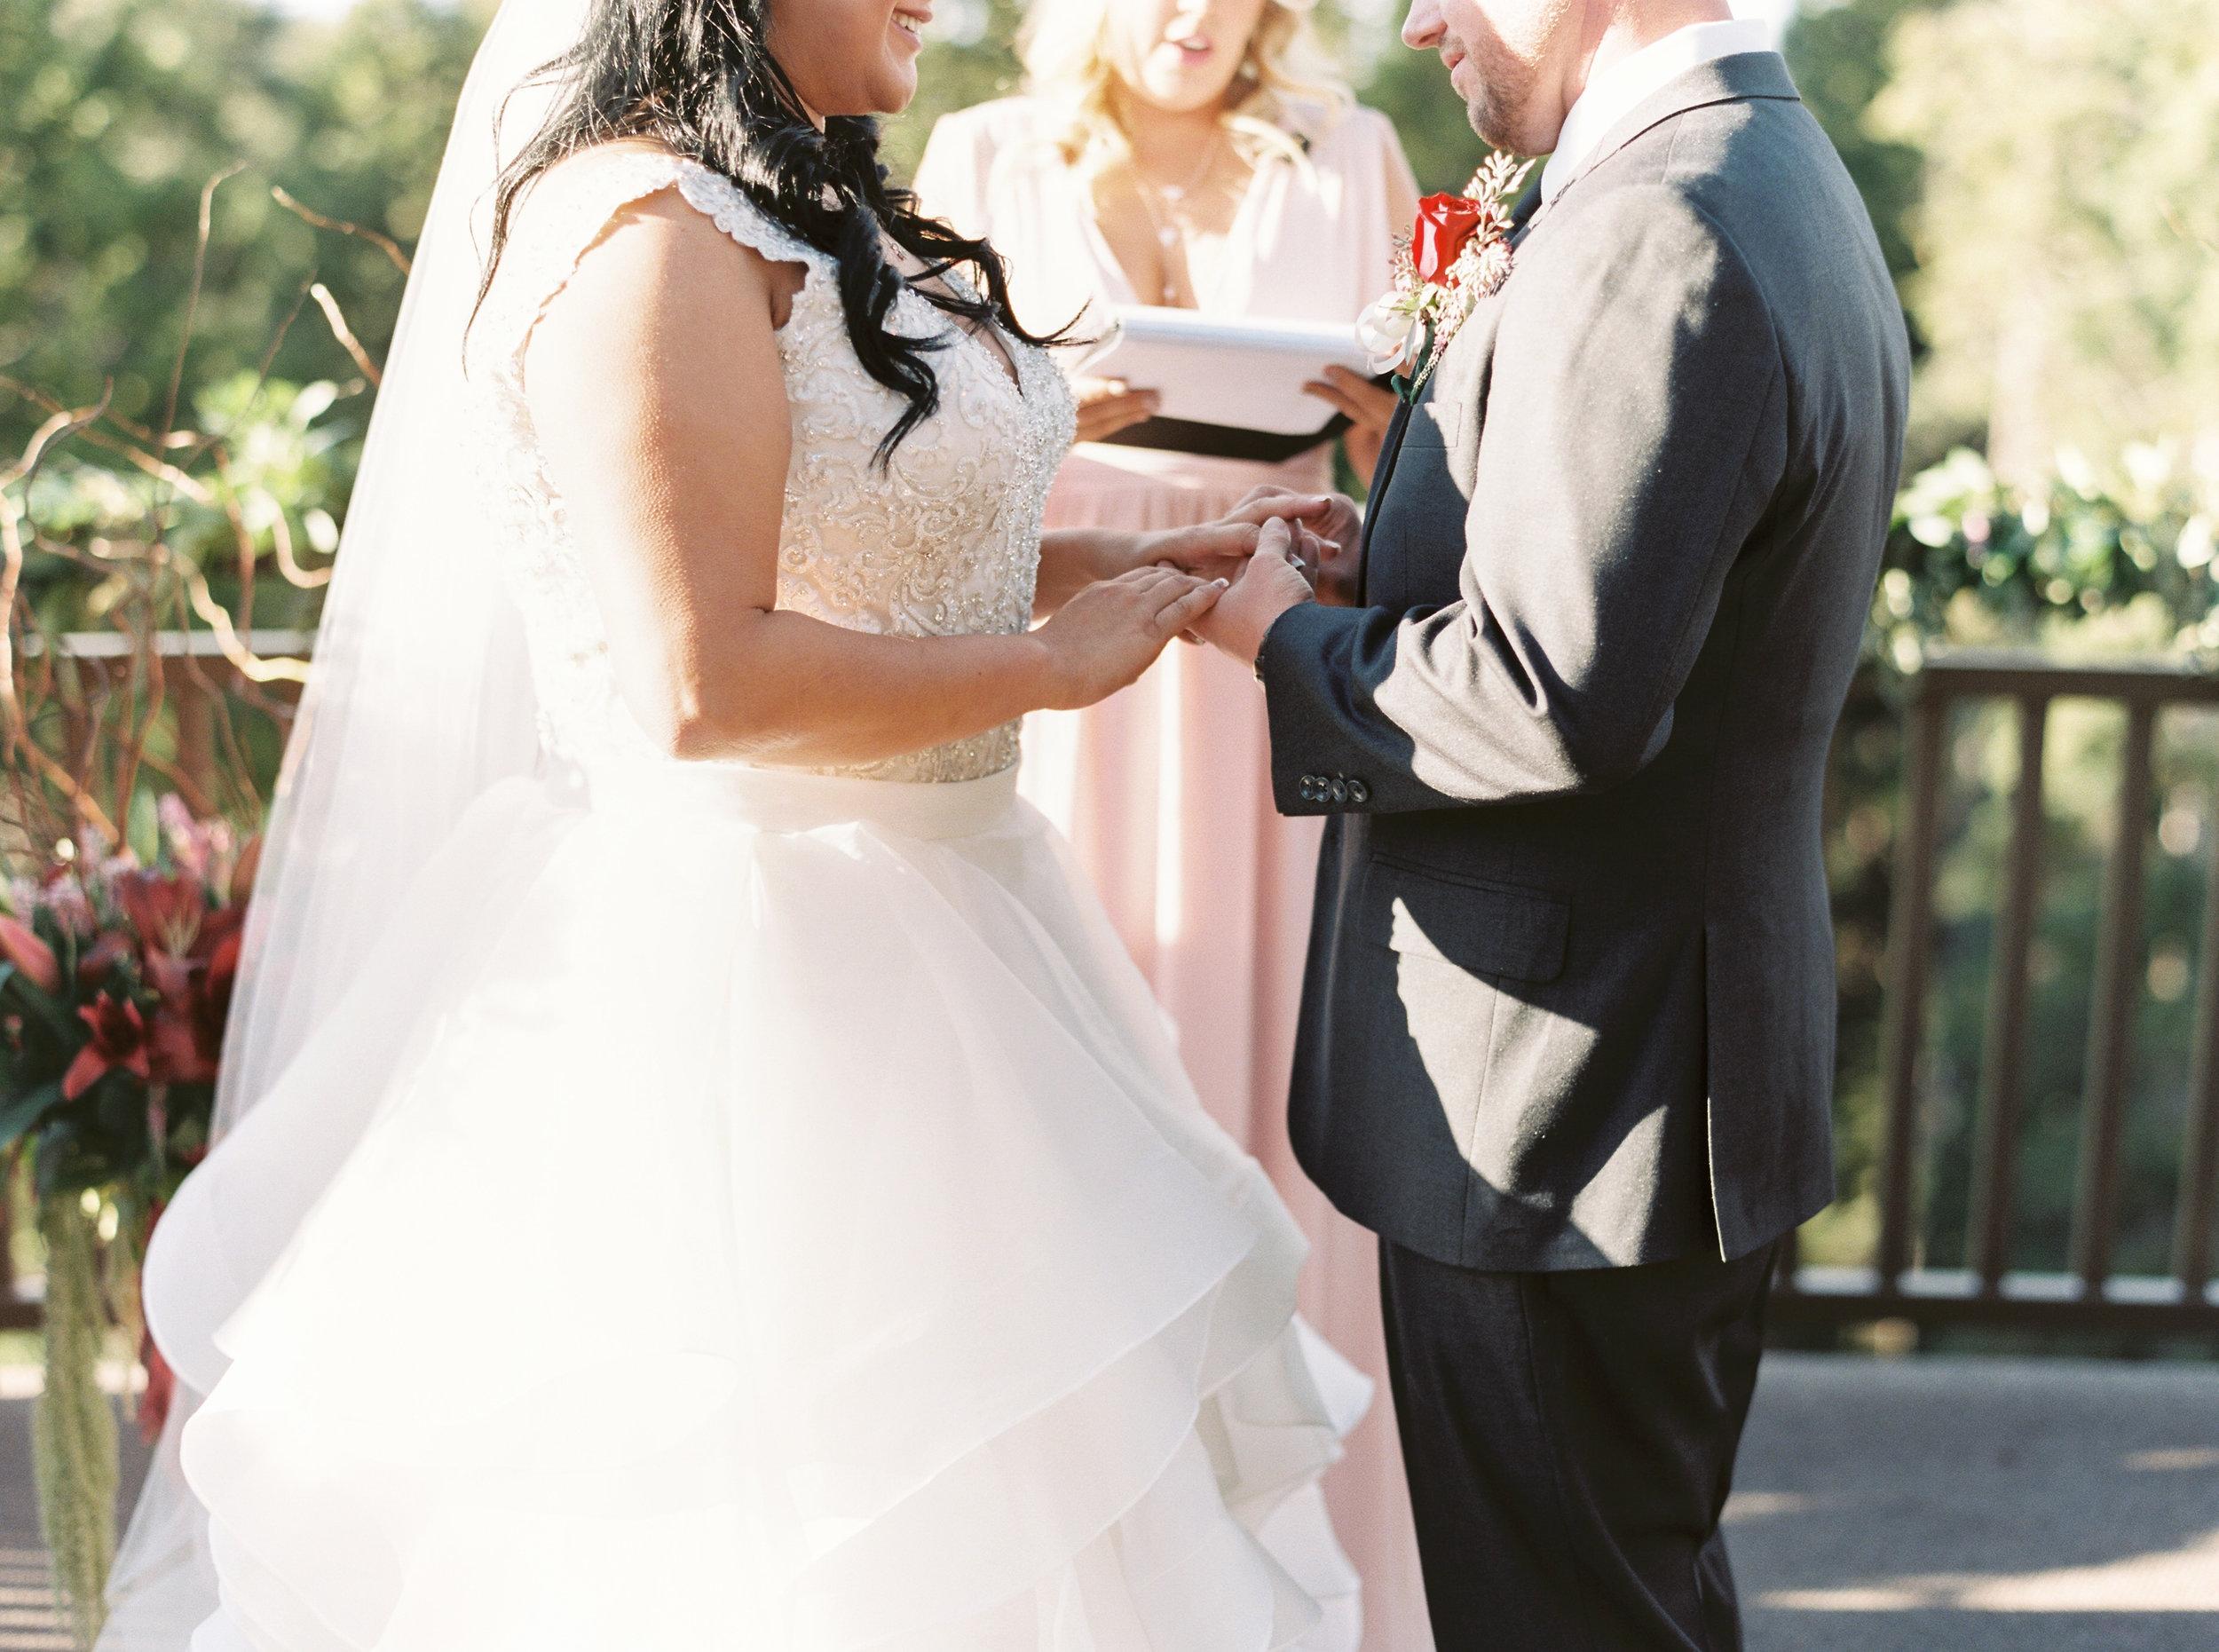 Tenaya-lodge-wedding-at-yosemite-national-park-california-79.jpg